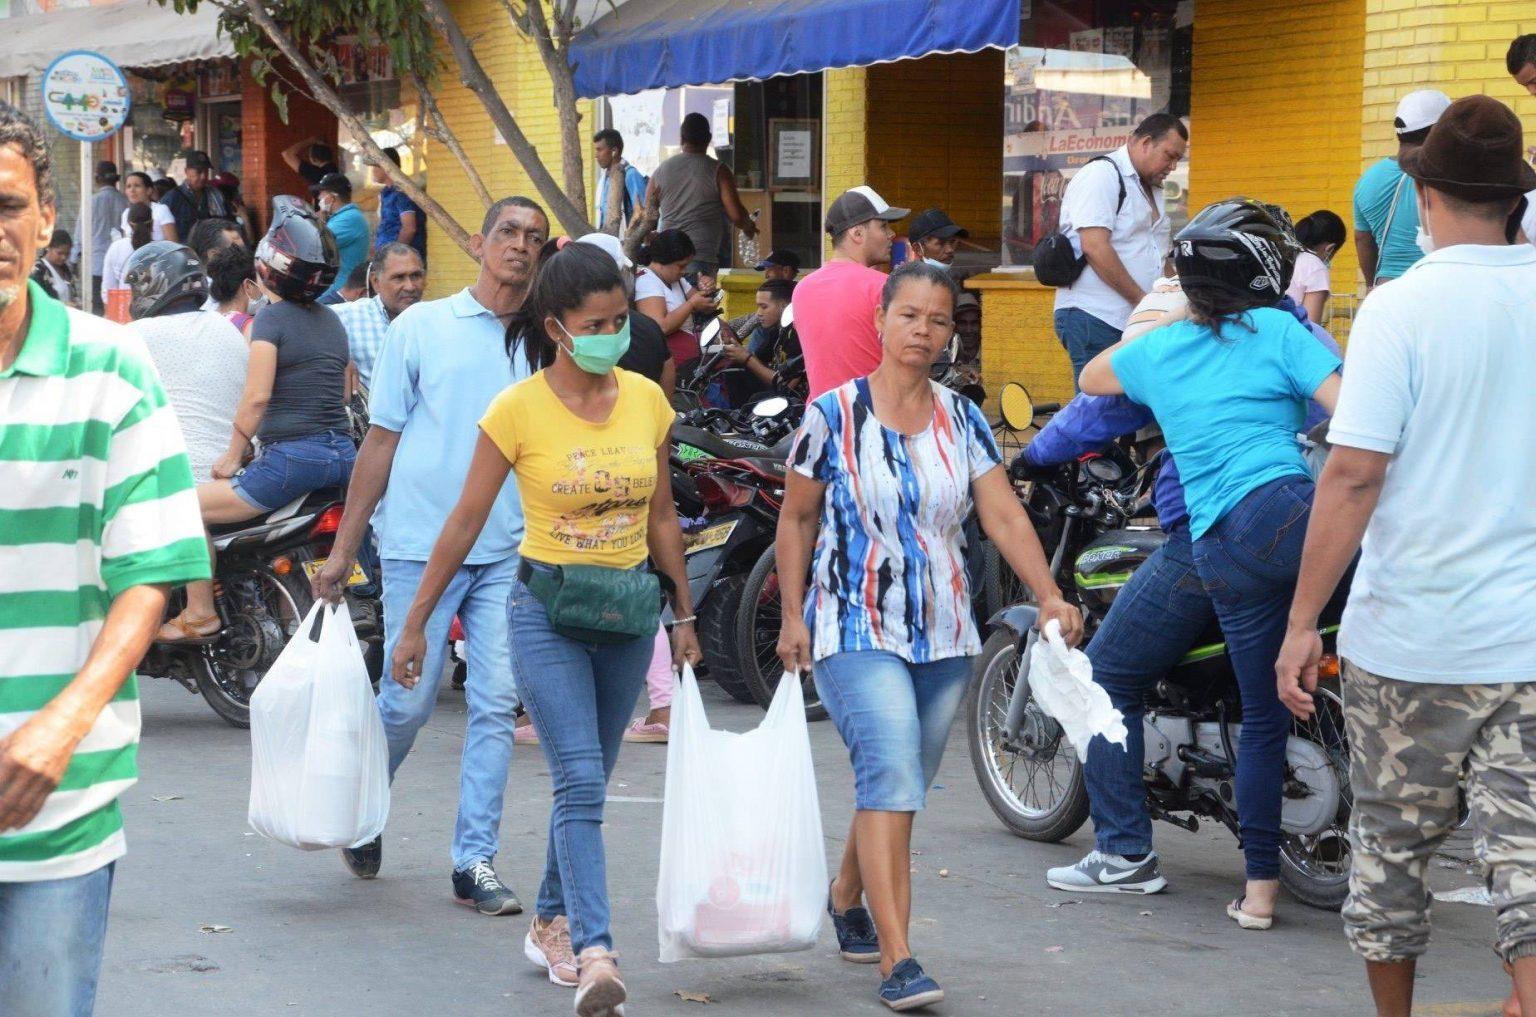 hoyennoticia.com, Santa Marta a punto de un nuevo pico por coronavirus